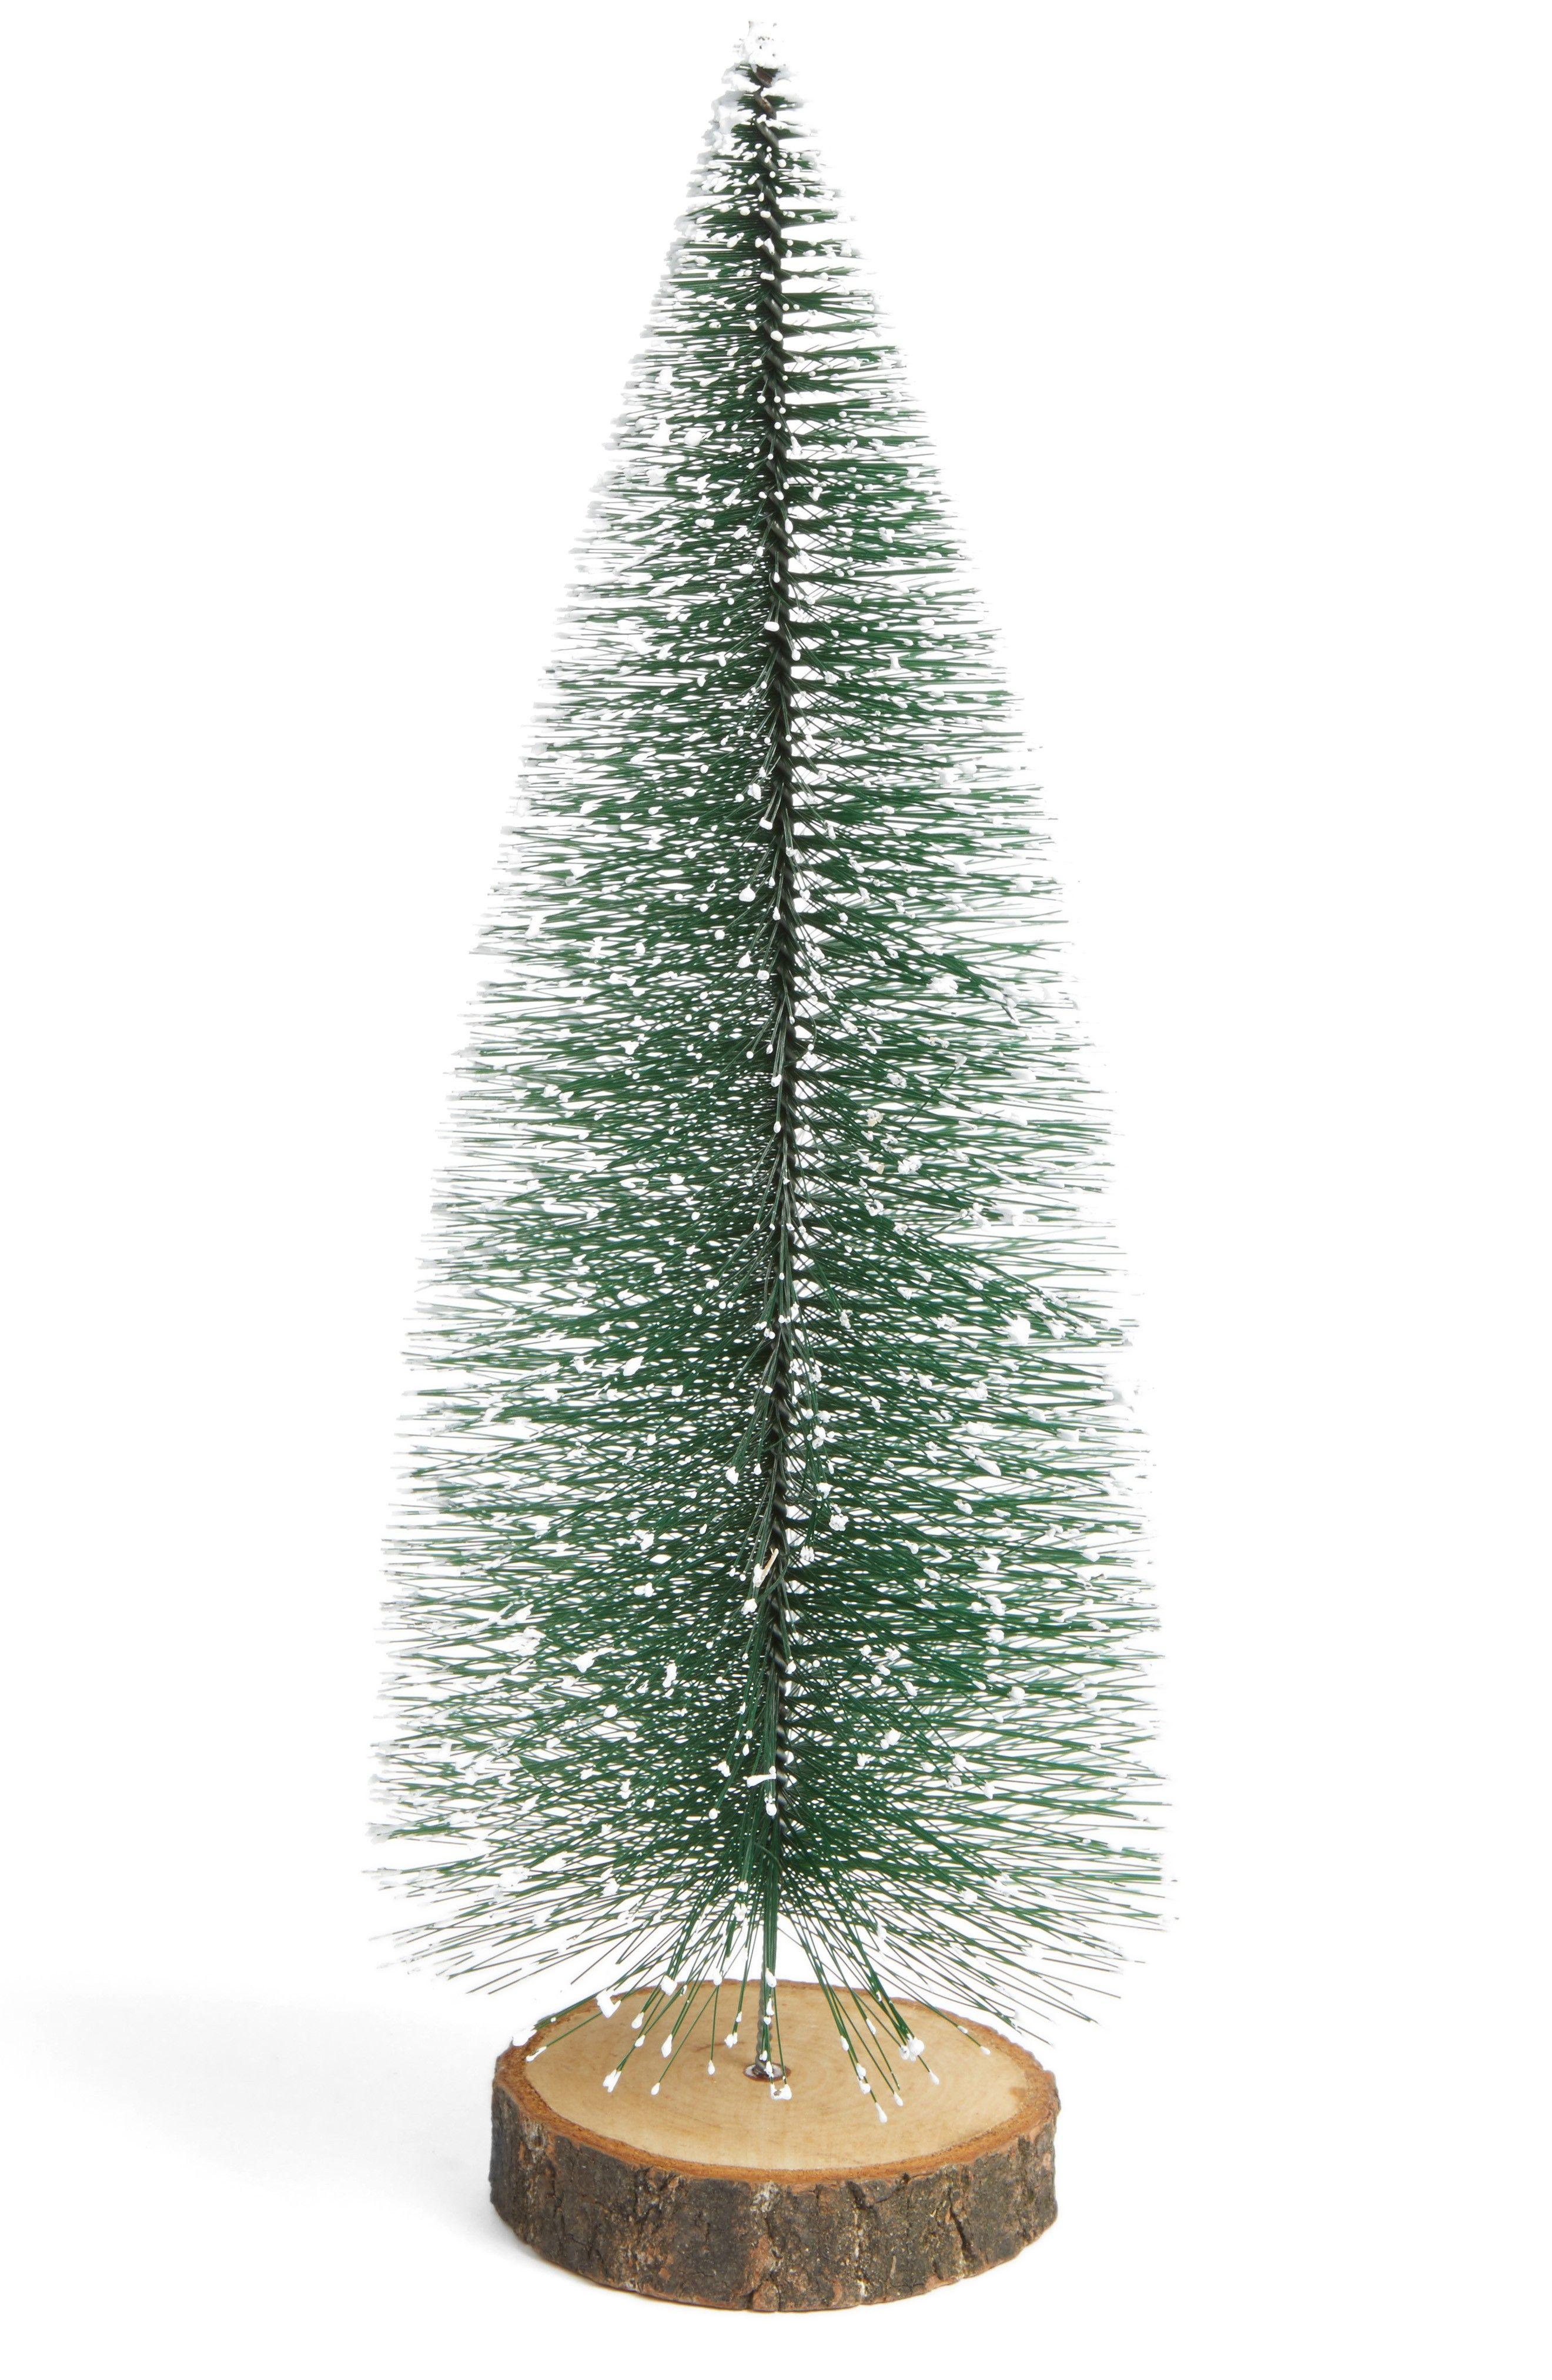 Christmas Decor Shop | Bottle brush trees, Christmas decor and Goodies